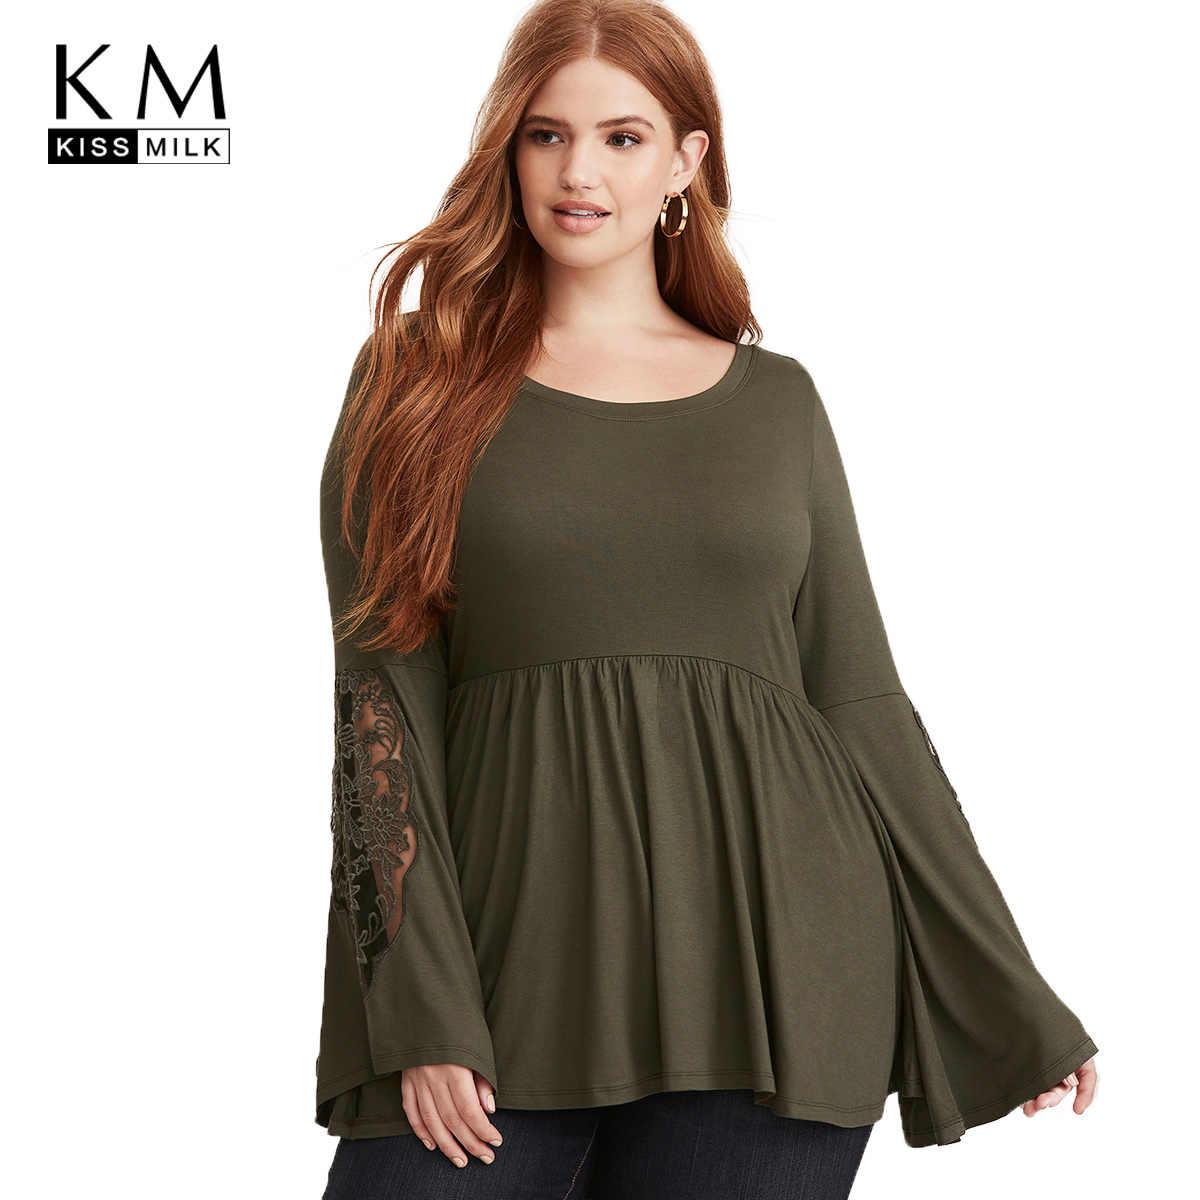 a89e65047261 kissmilk Plus Size Patchwork Lace Women shirts Hollow Out Long Sleeve  T-shirts Lace Up